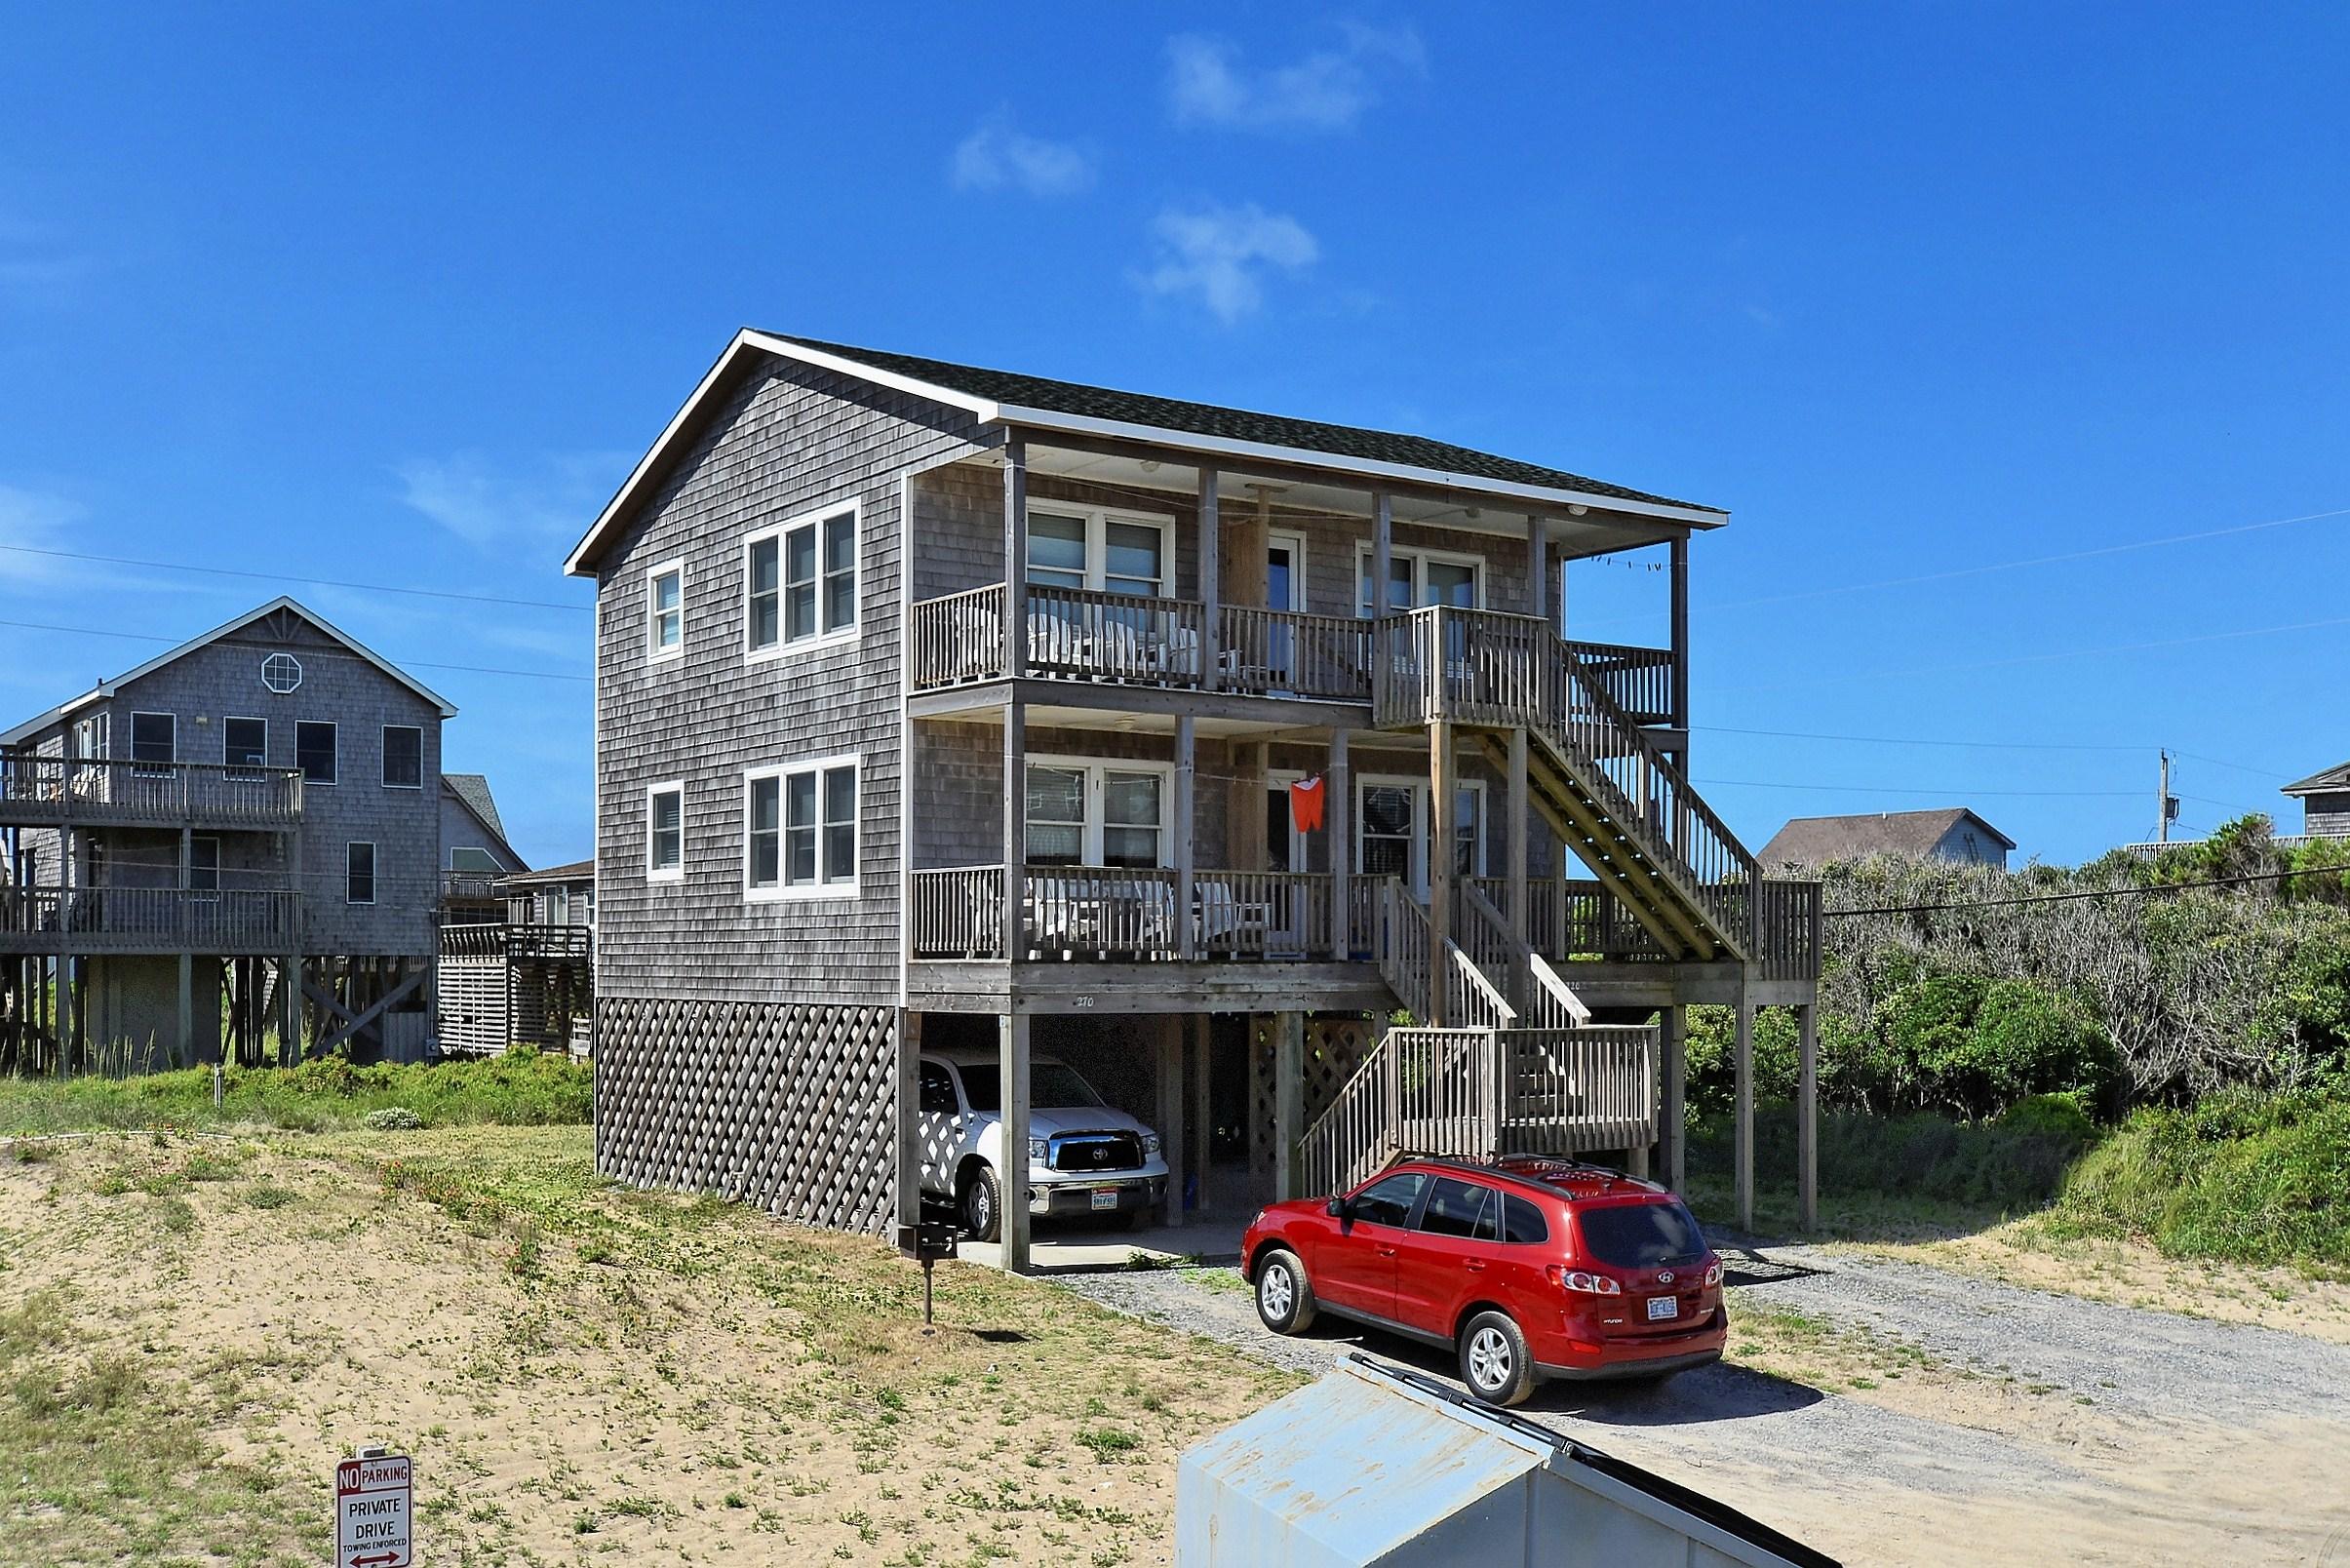 carolina rentals interior cabins vacation north river rental mountains cabin ste arkansas mulberry in